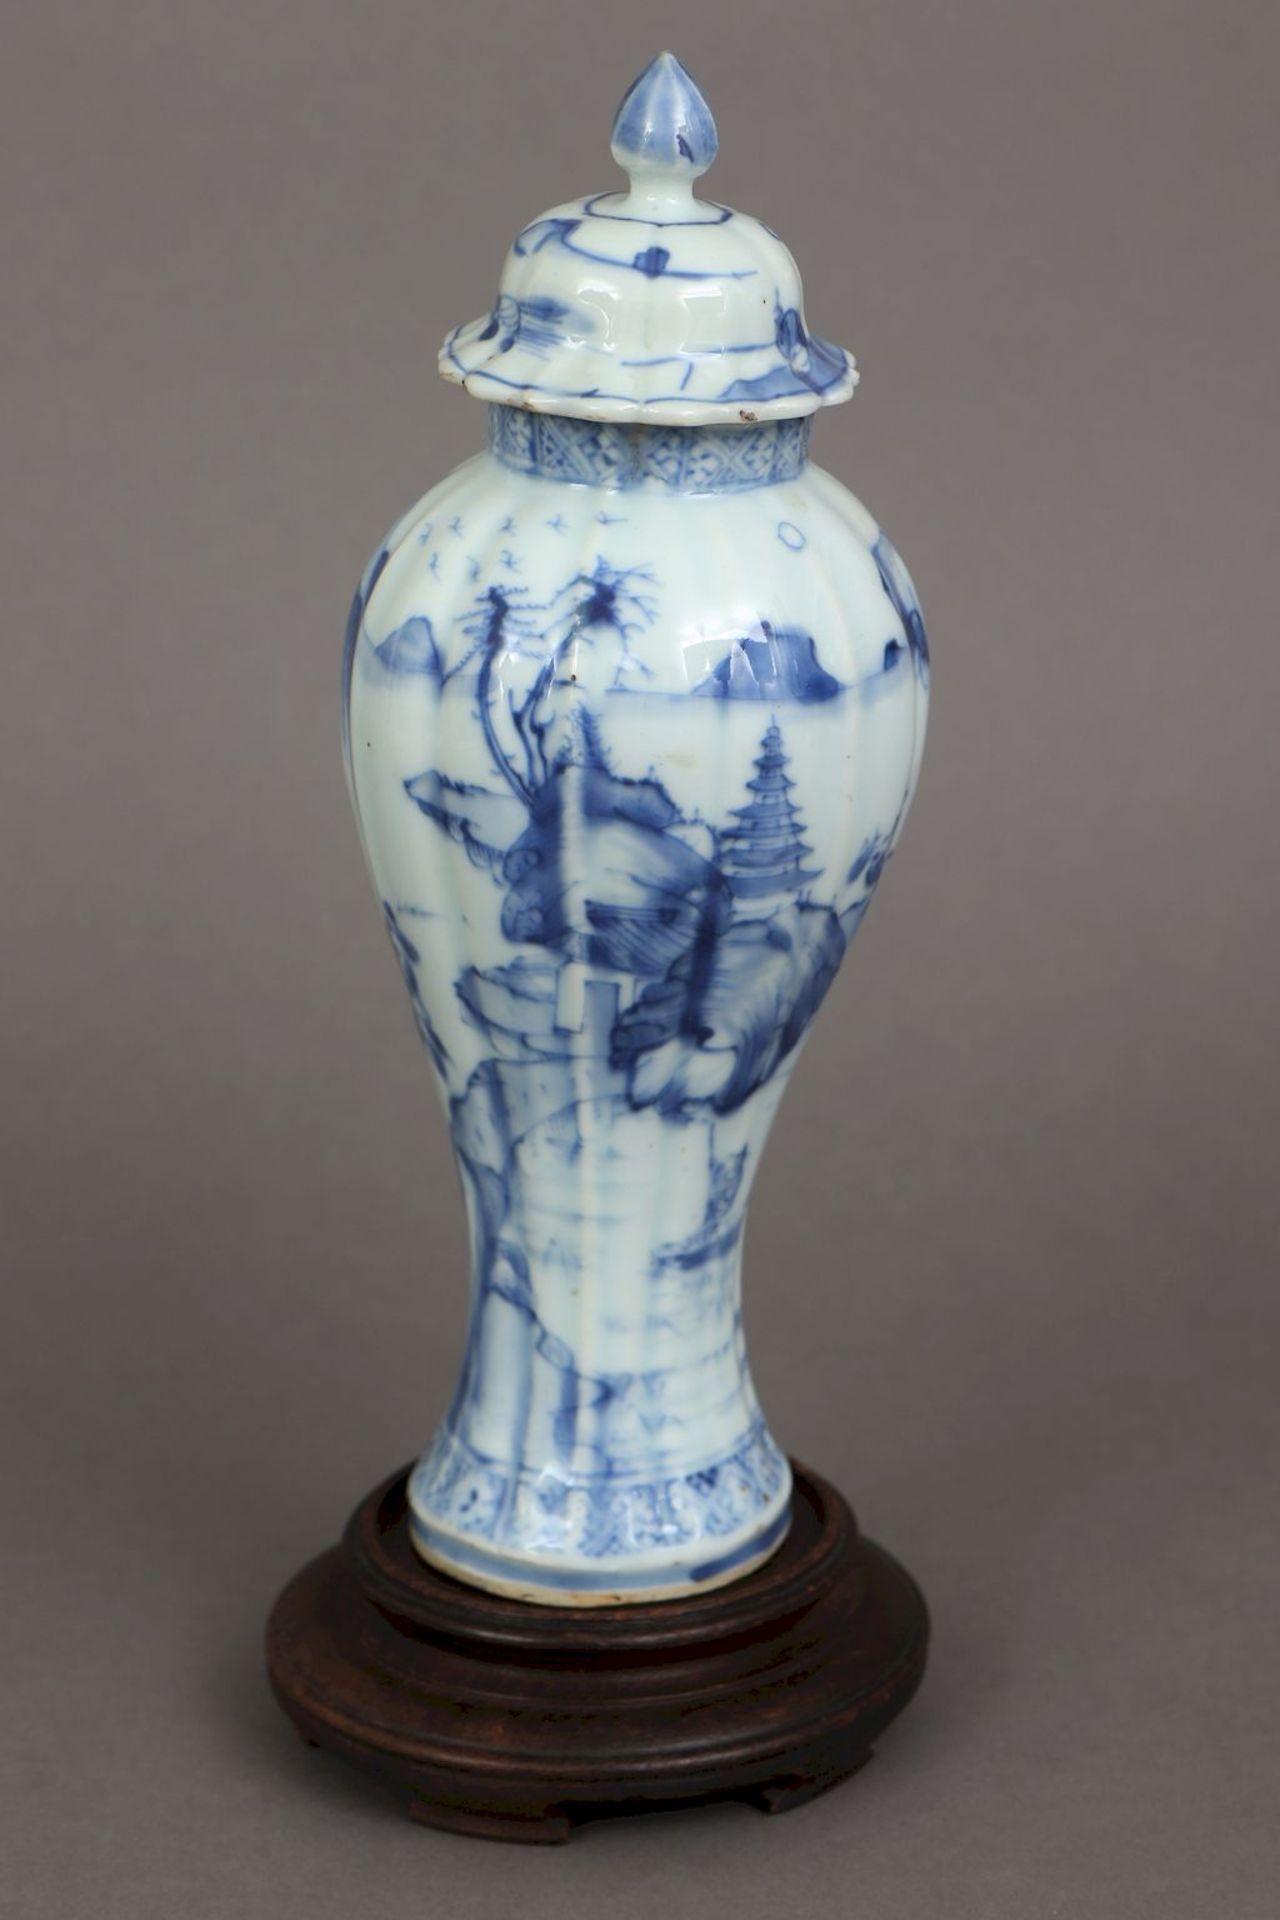 Chinesisches Vasengefäß mit Blaumalerei - Image 2 of 5